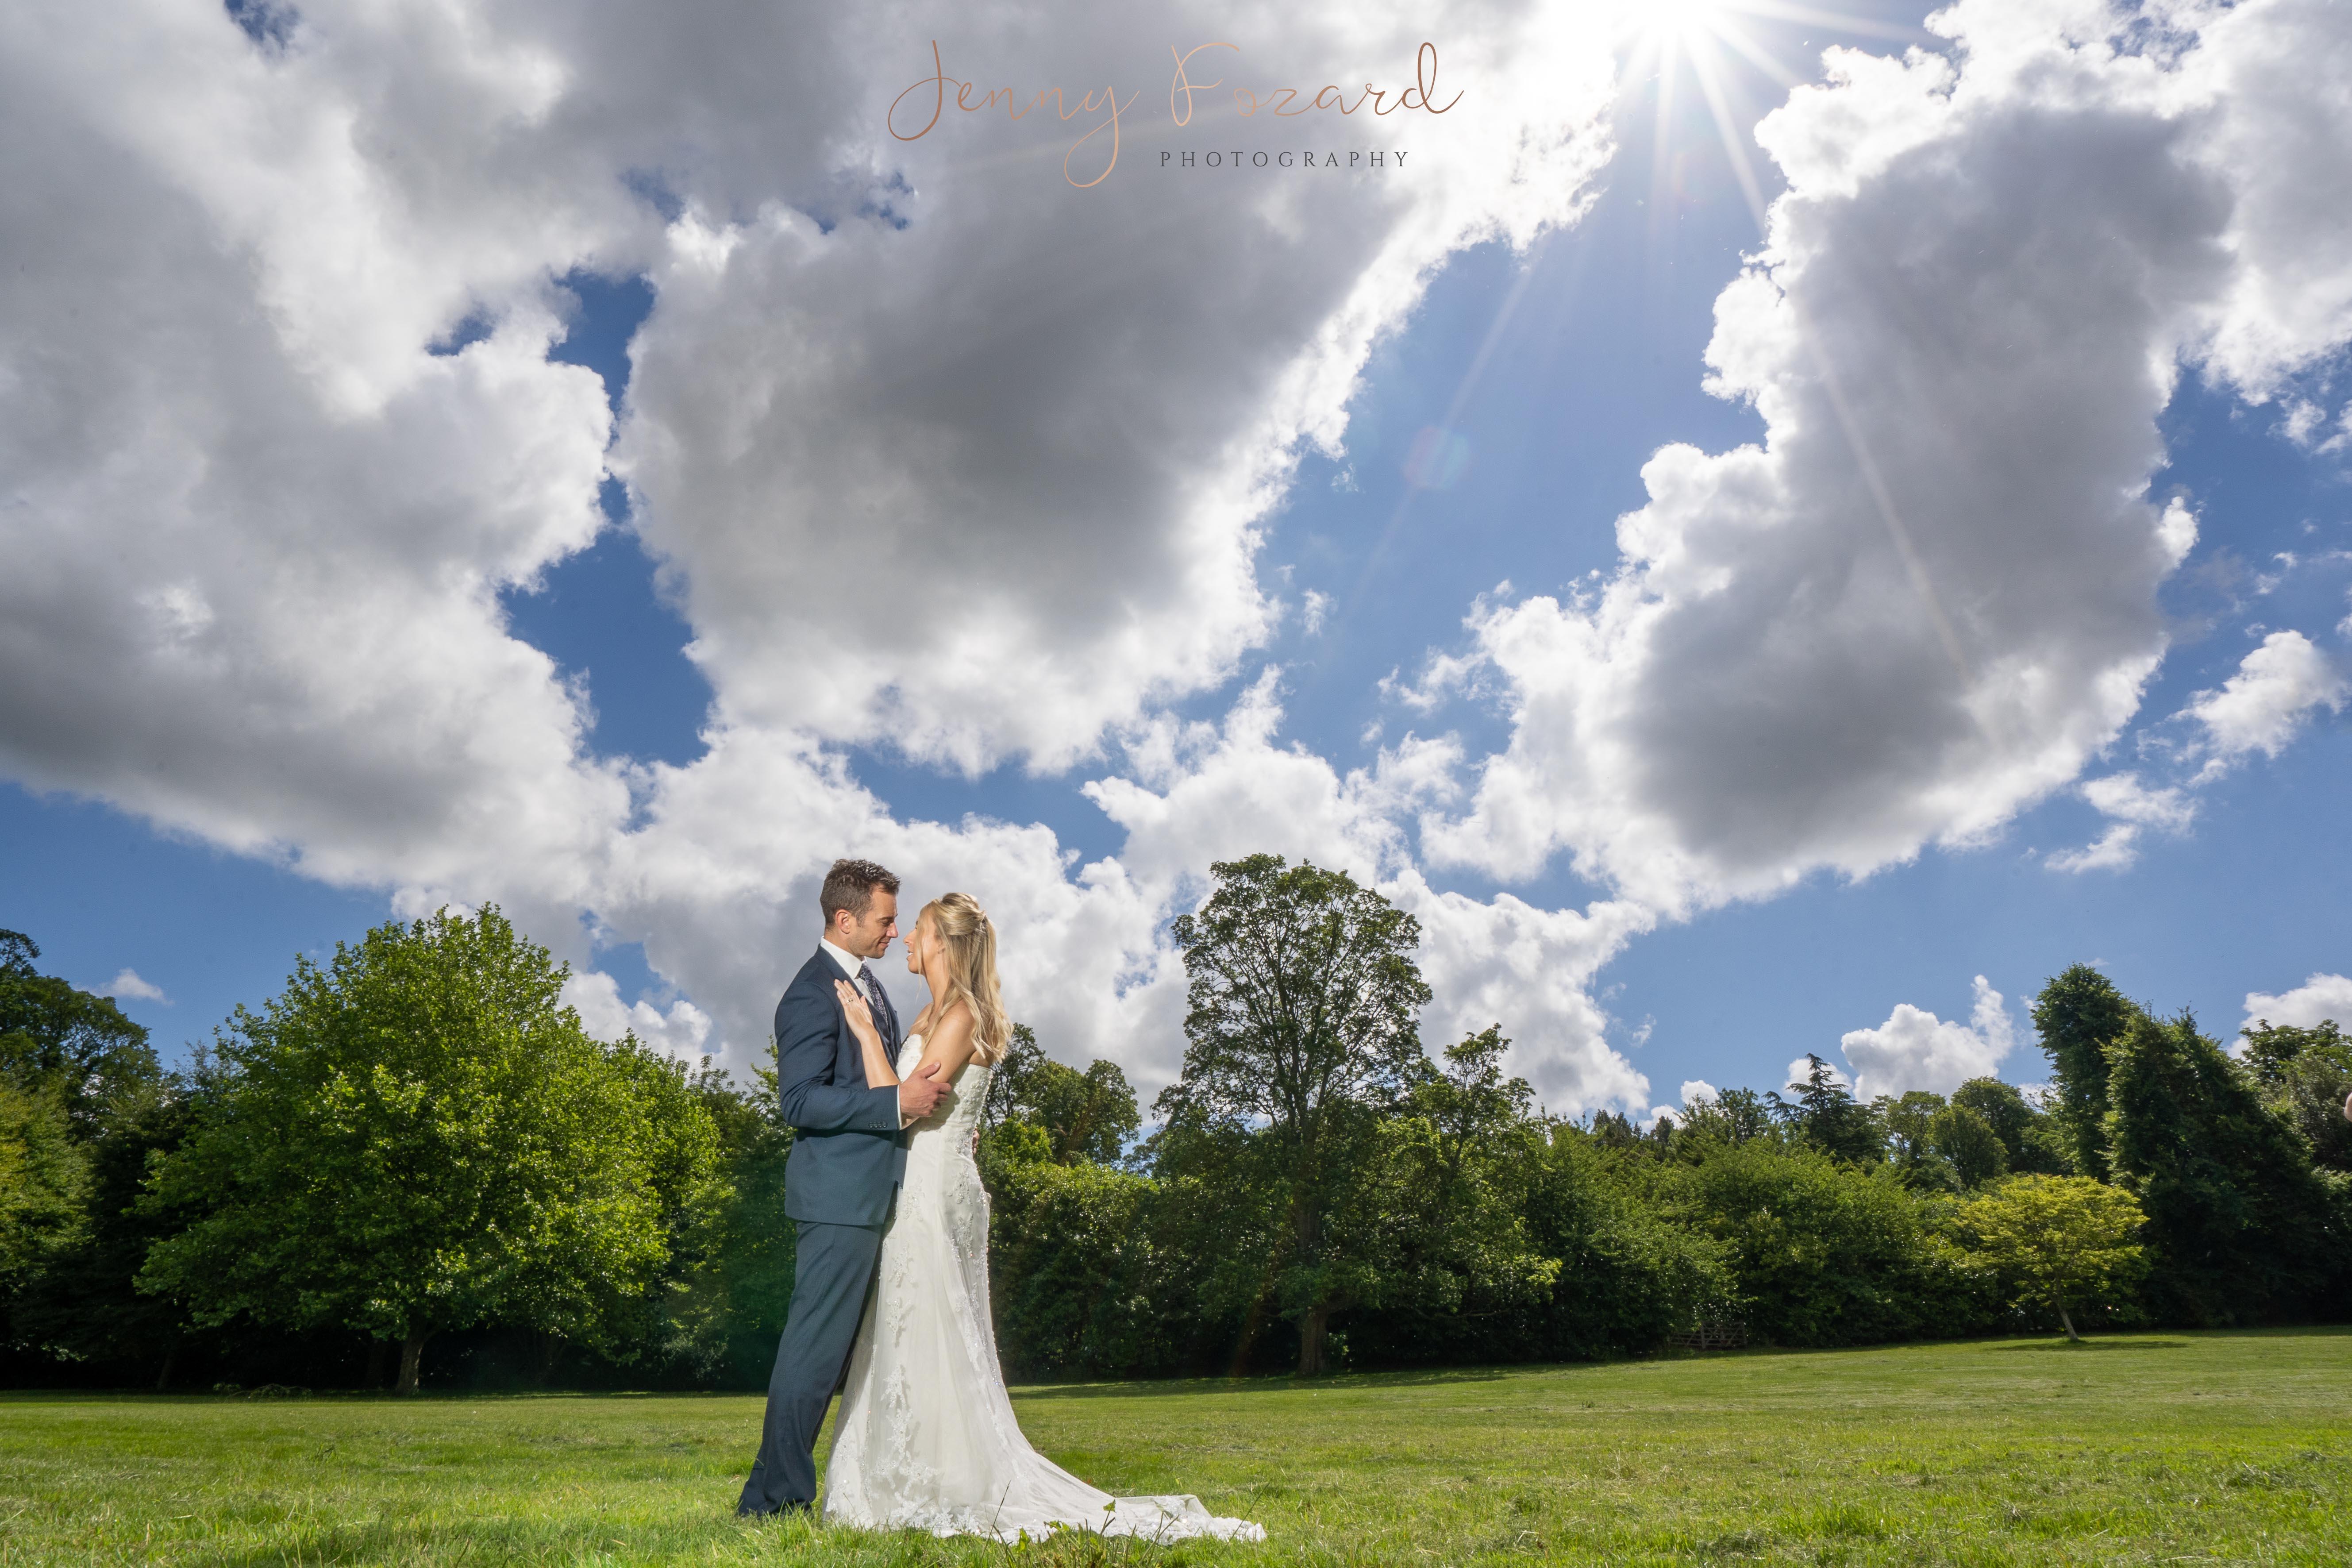 15 Newcastle-north-east-northumberland-durham-scottish-borders-photo-photographer-photography-wedding-tyne-and-wear